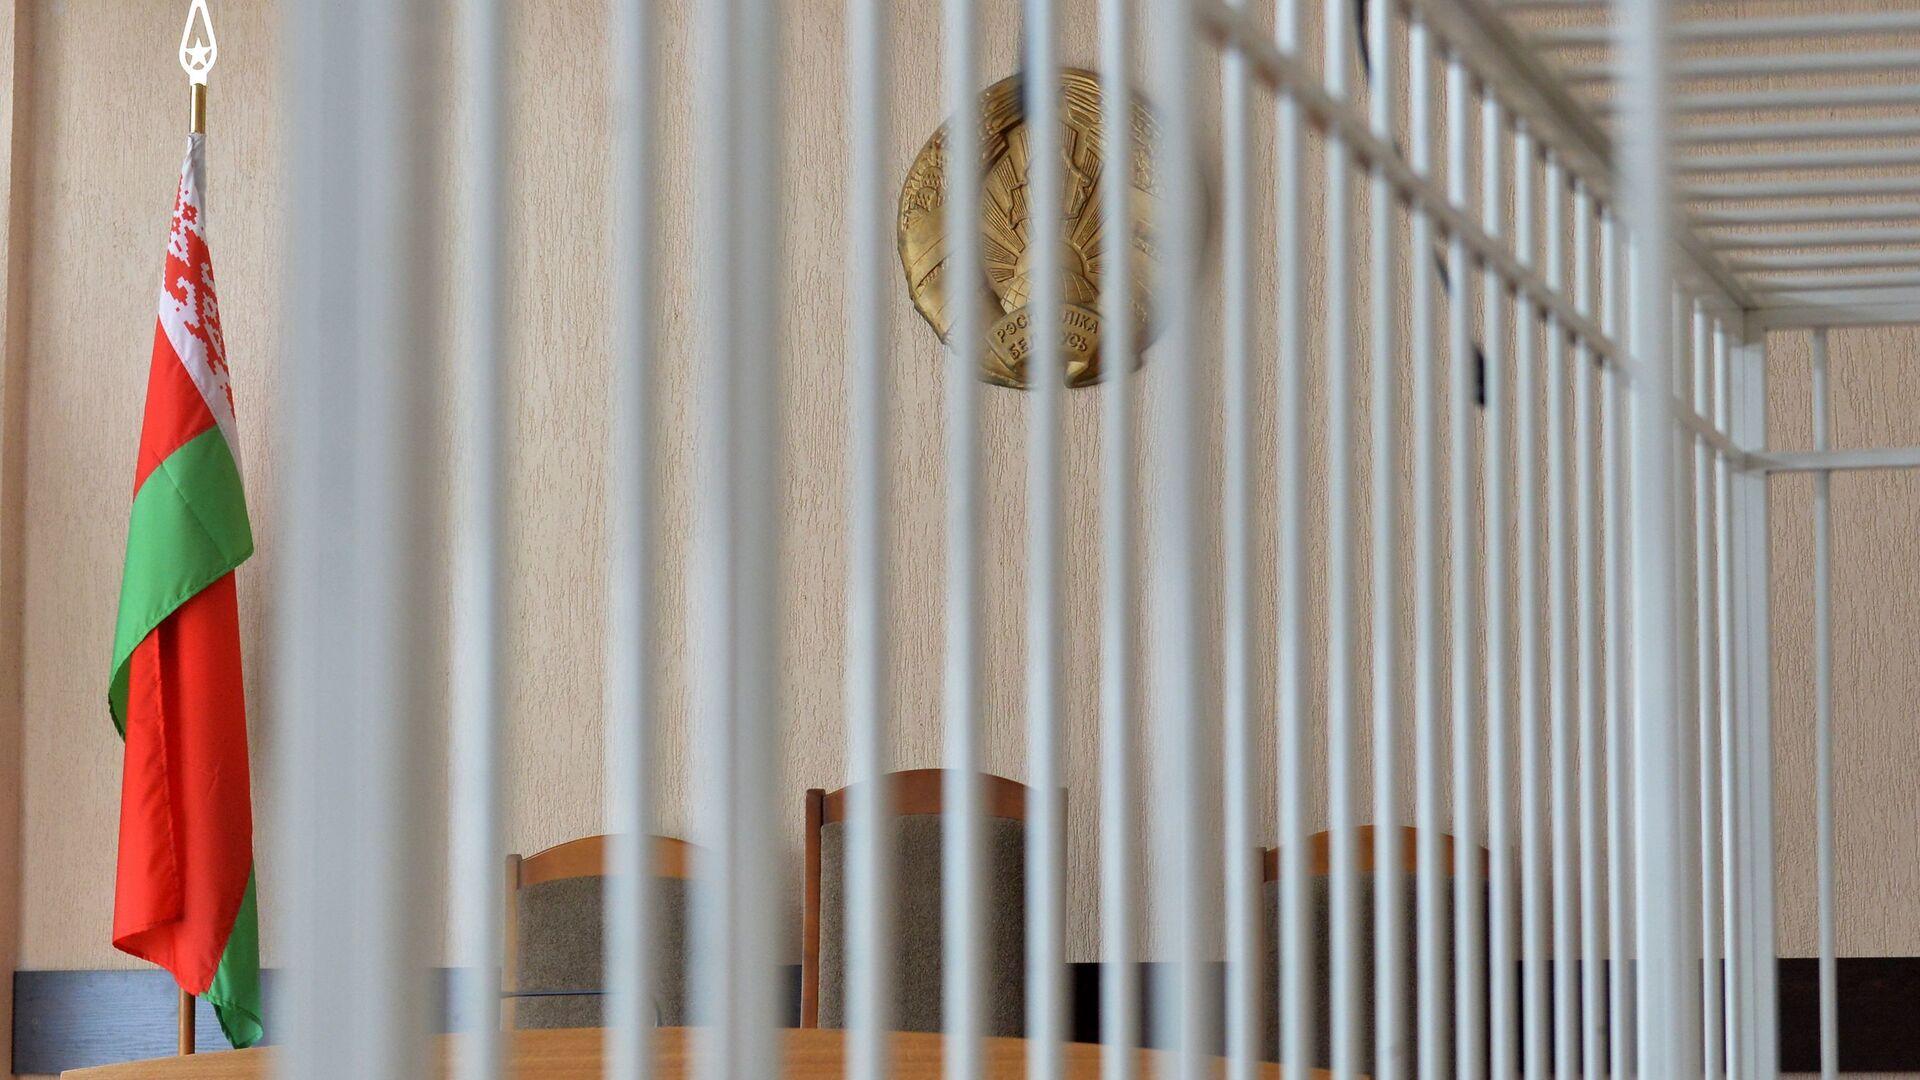 Зал судебных заседаний - Sputnik Беларусь, 1920, 05.10.2021